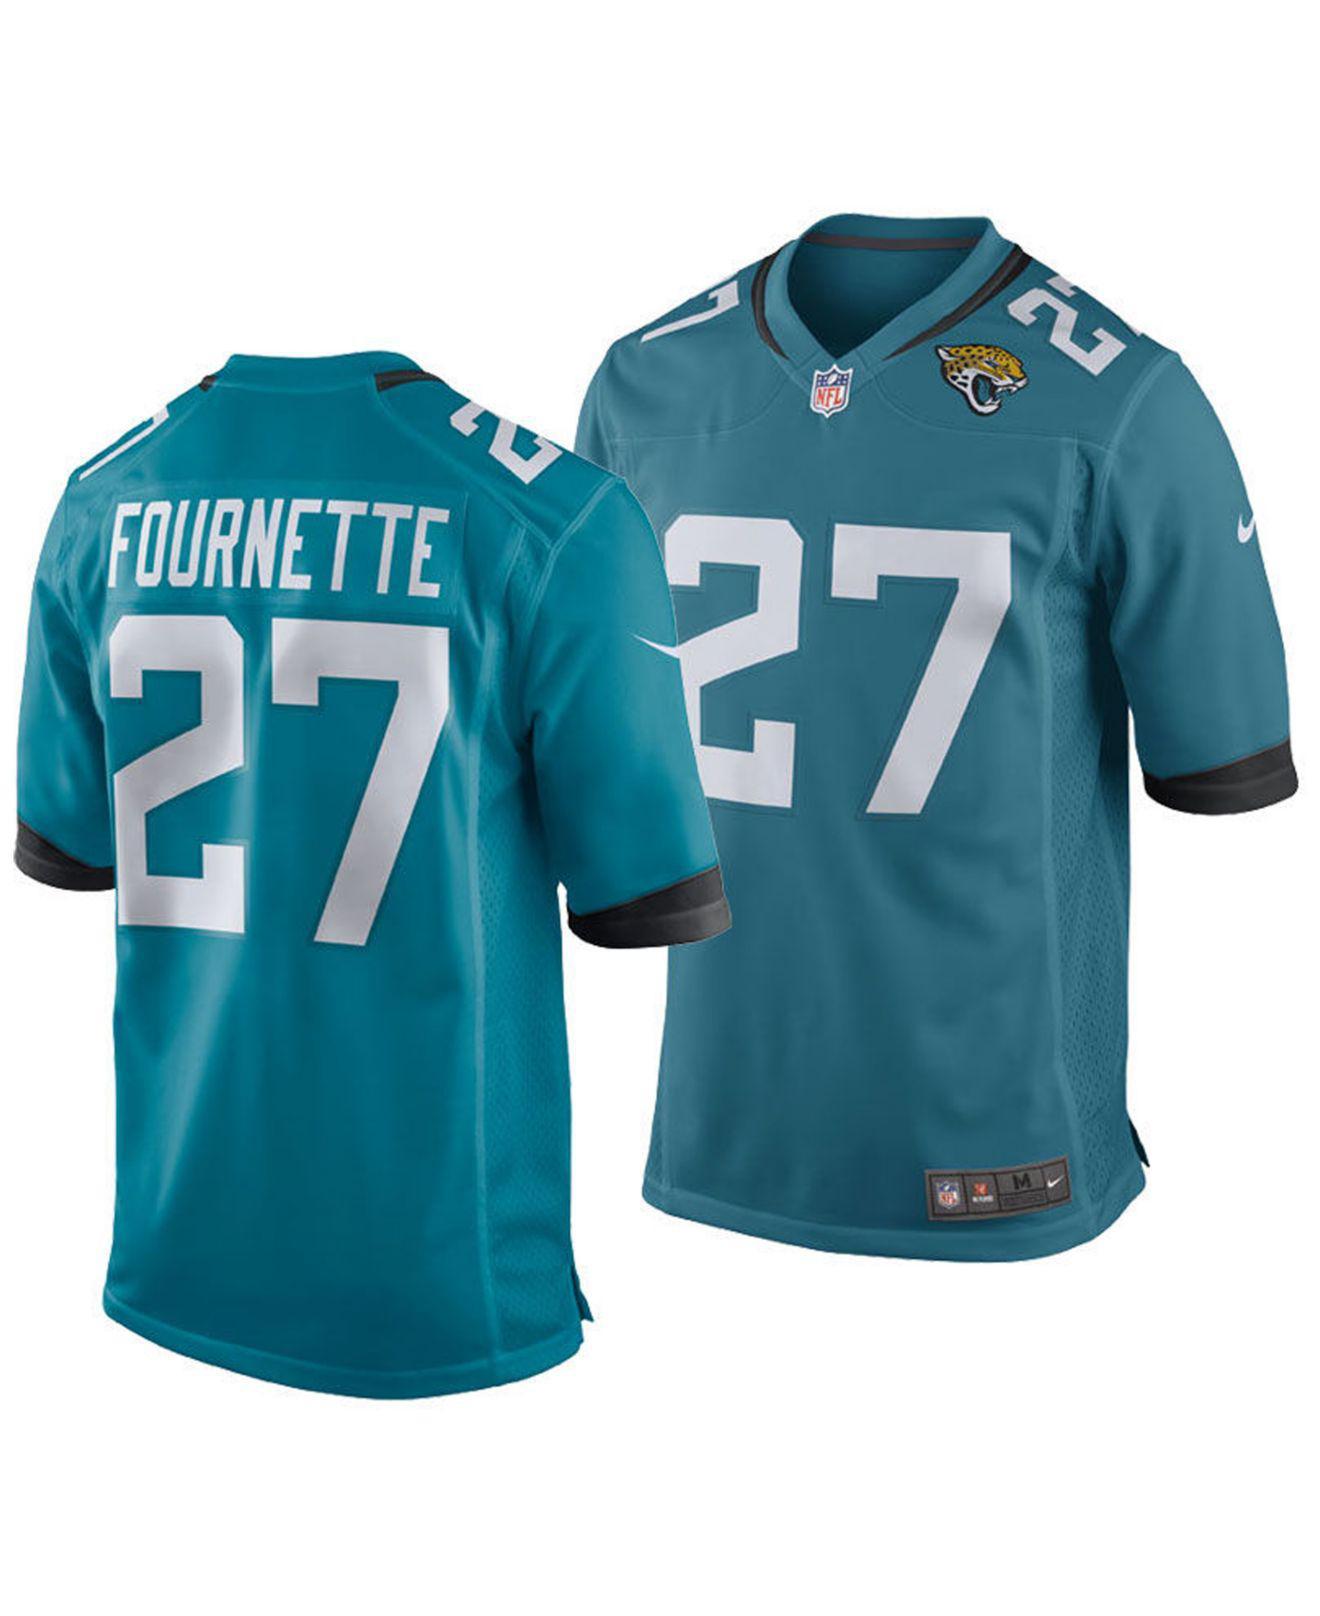 785eb53a2 Lyst - Nike Leonard Fournette Jacksonville Jaguars Game Jersey in ...